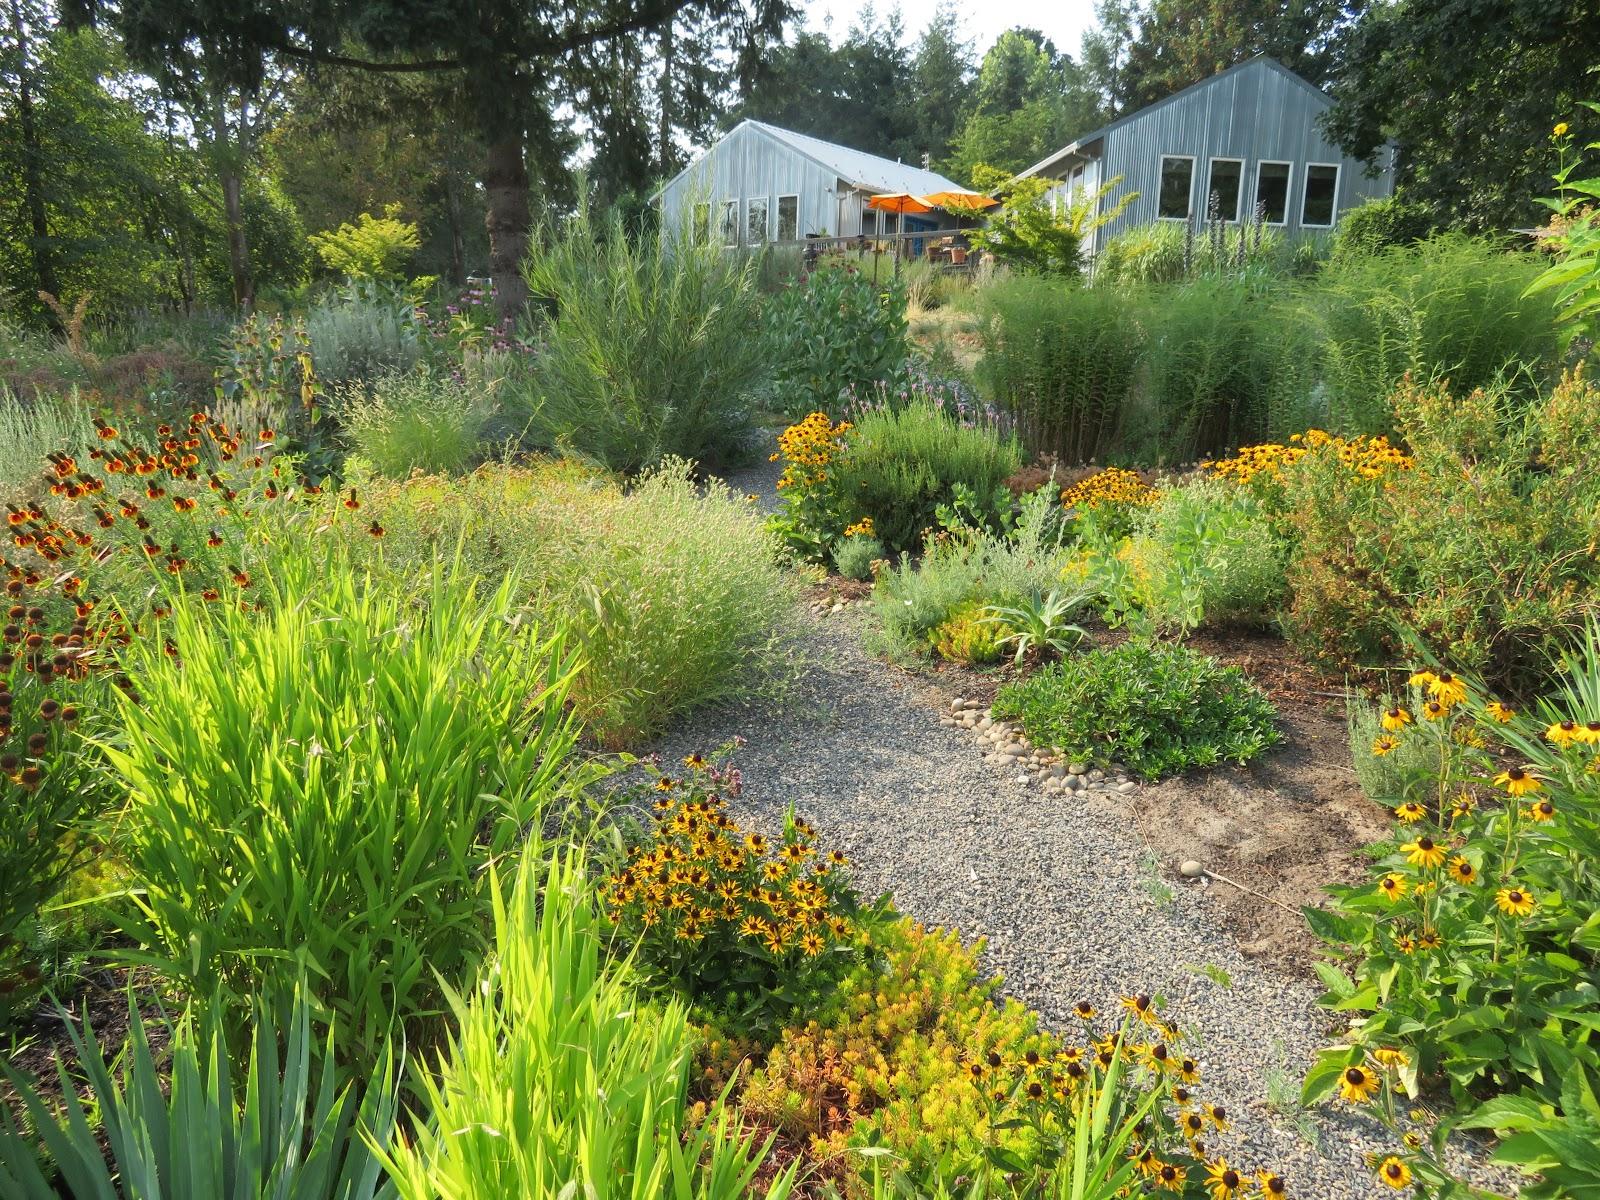 Late August Garden on